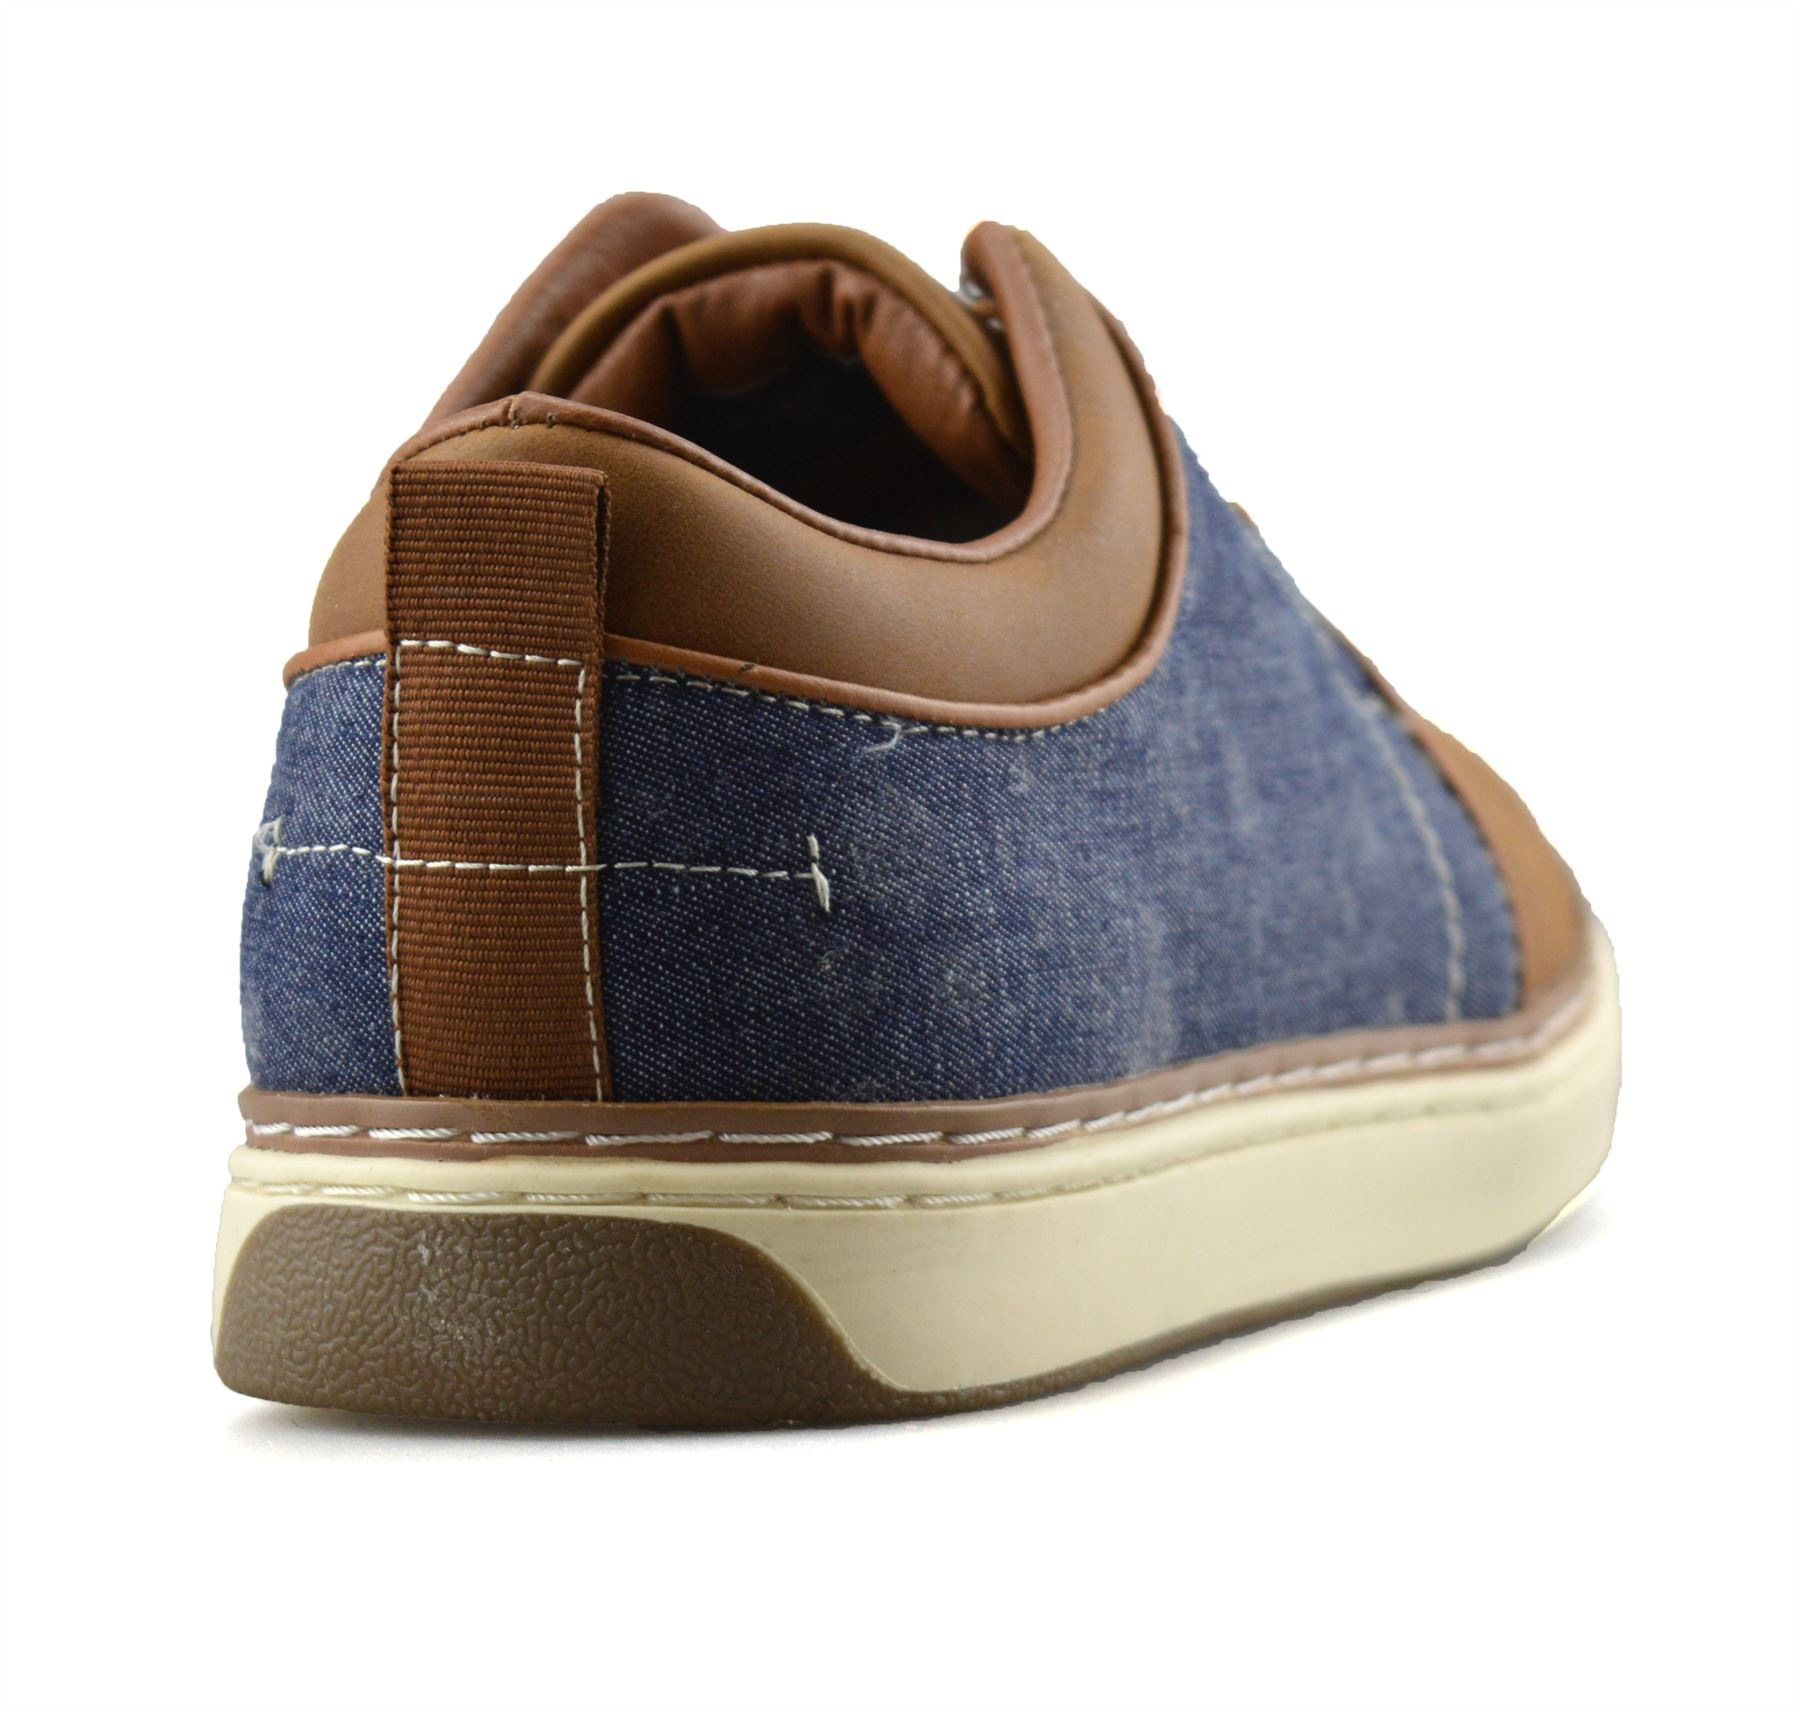 Homme-Nouveau-Casual-Smart-bateau-pont-Mocassin-Walking-Driving-Work-Lace-Up-Chaussures-Taille miniature 20